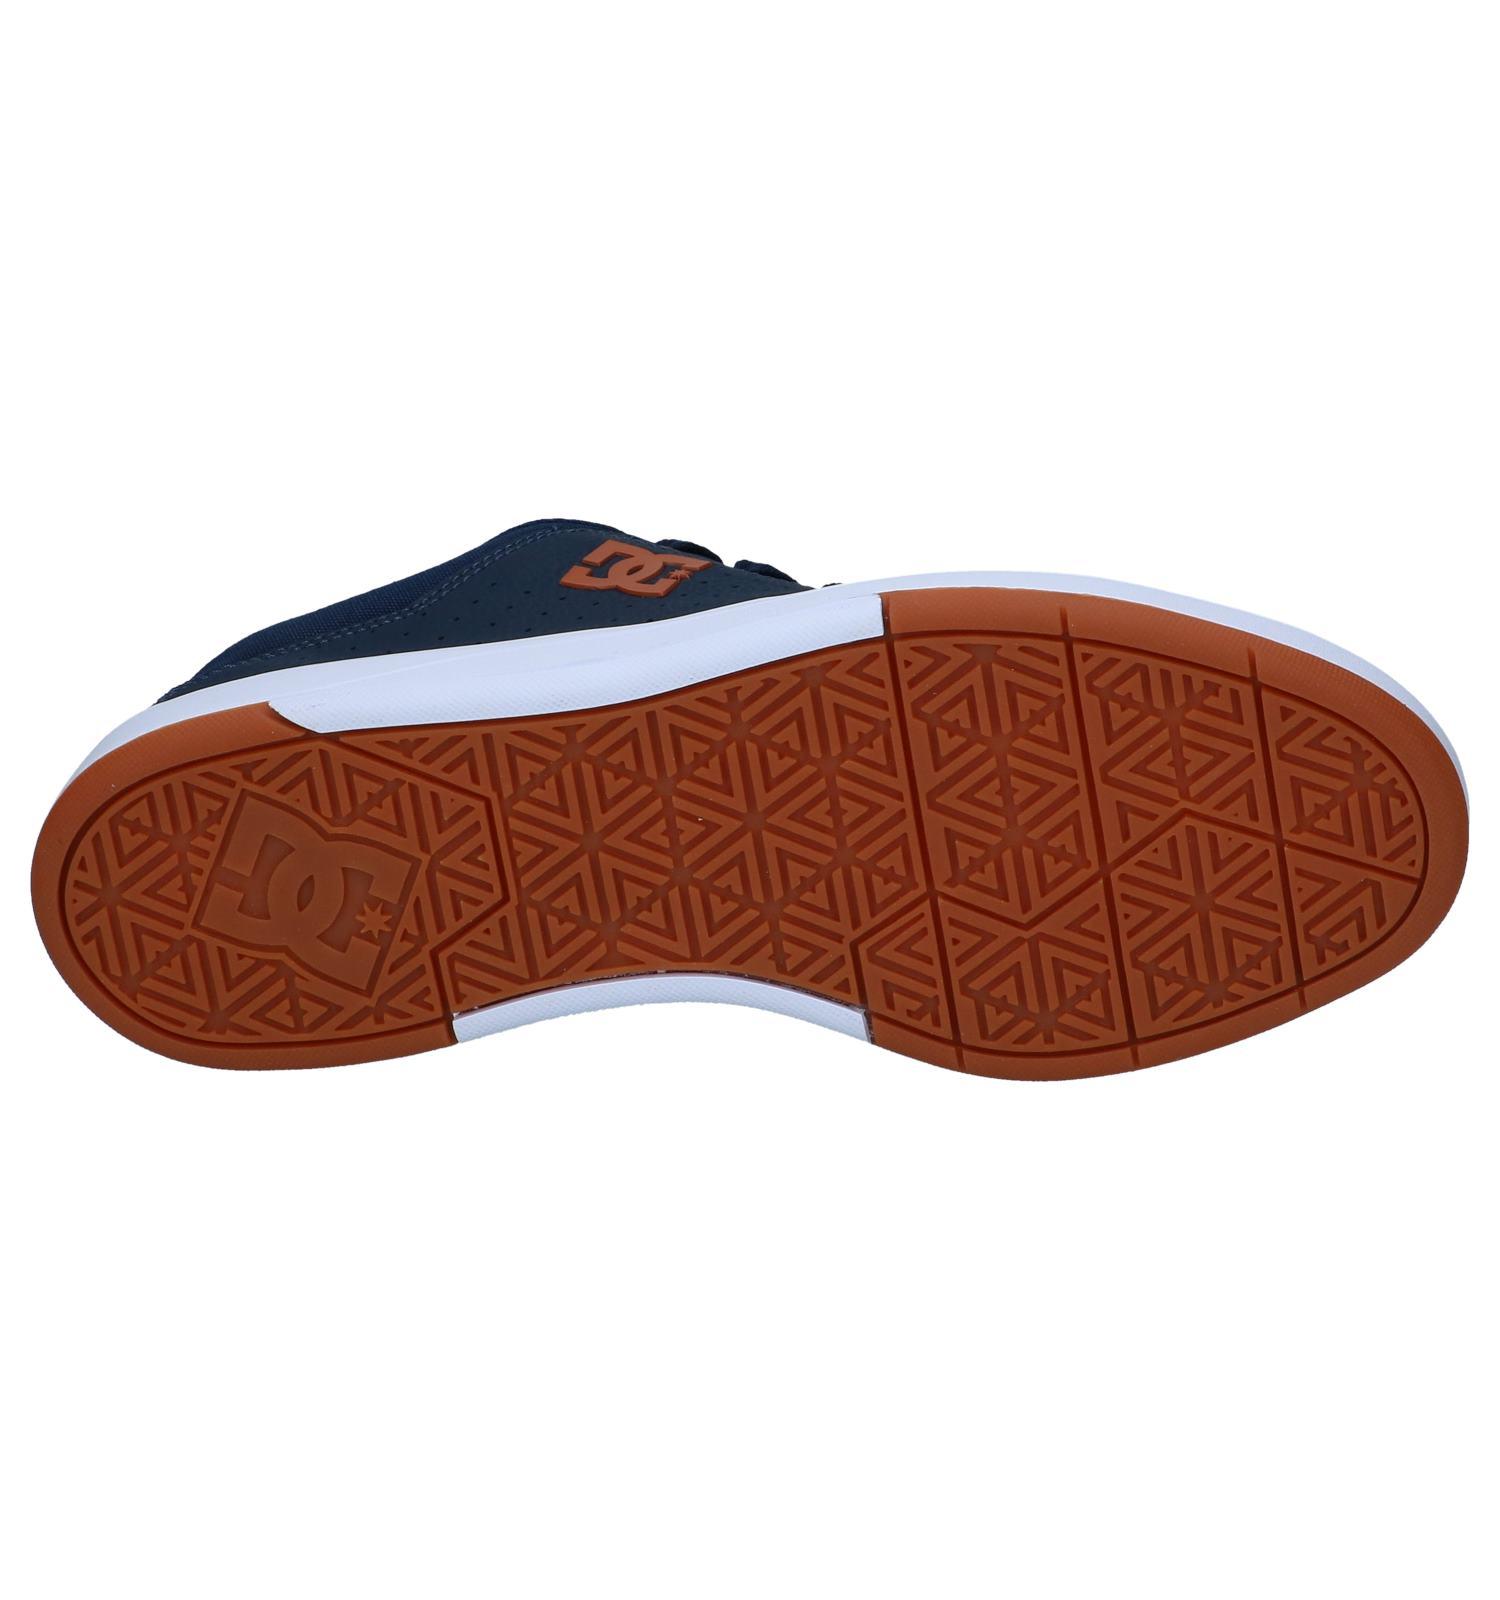 Dc Shoes Donkerblauwe Skateschoenen Plaza Lage jUqGpMVLSz